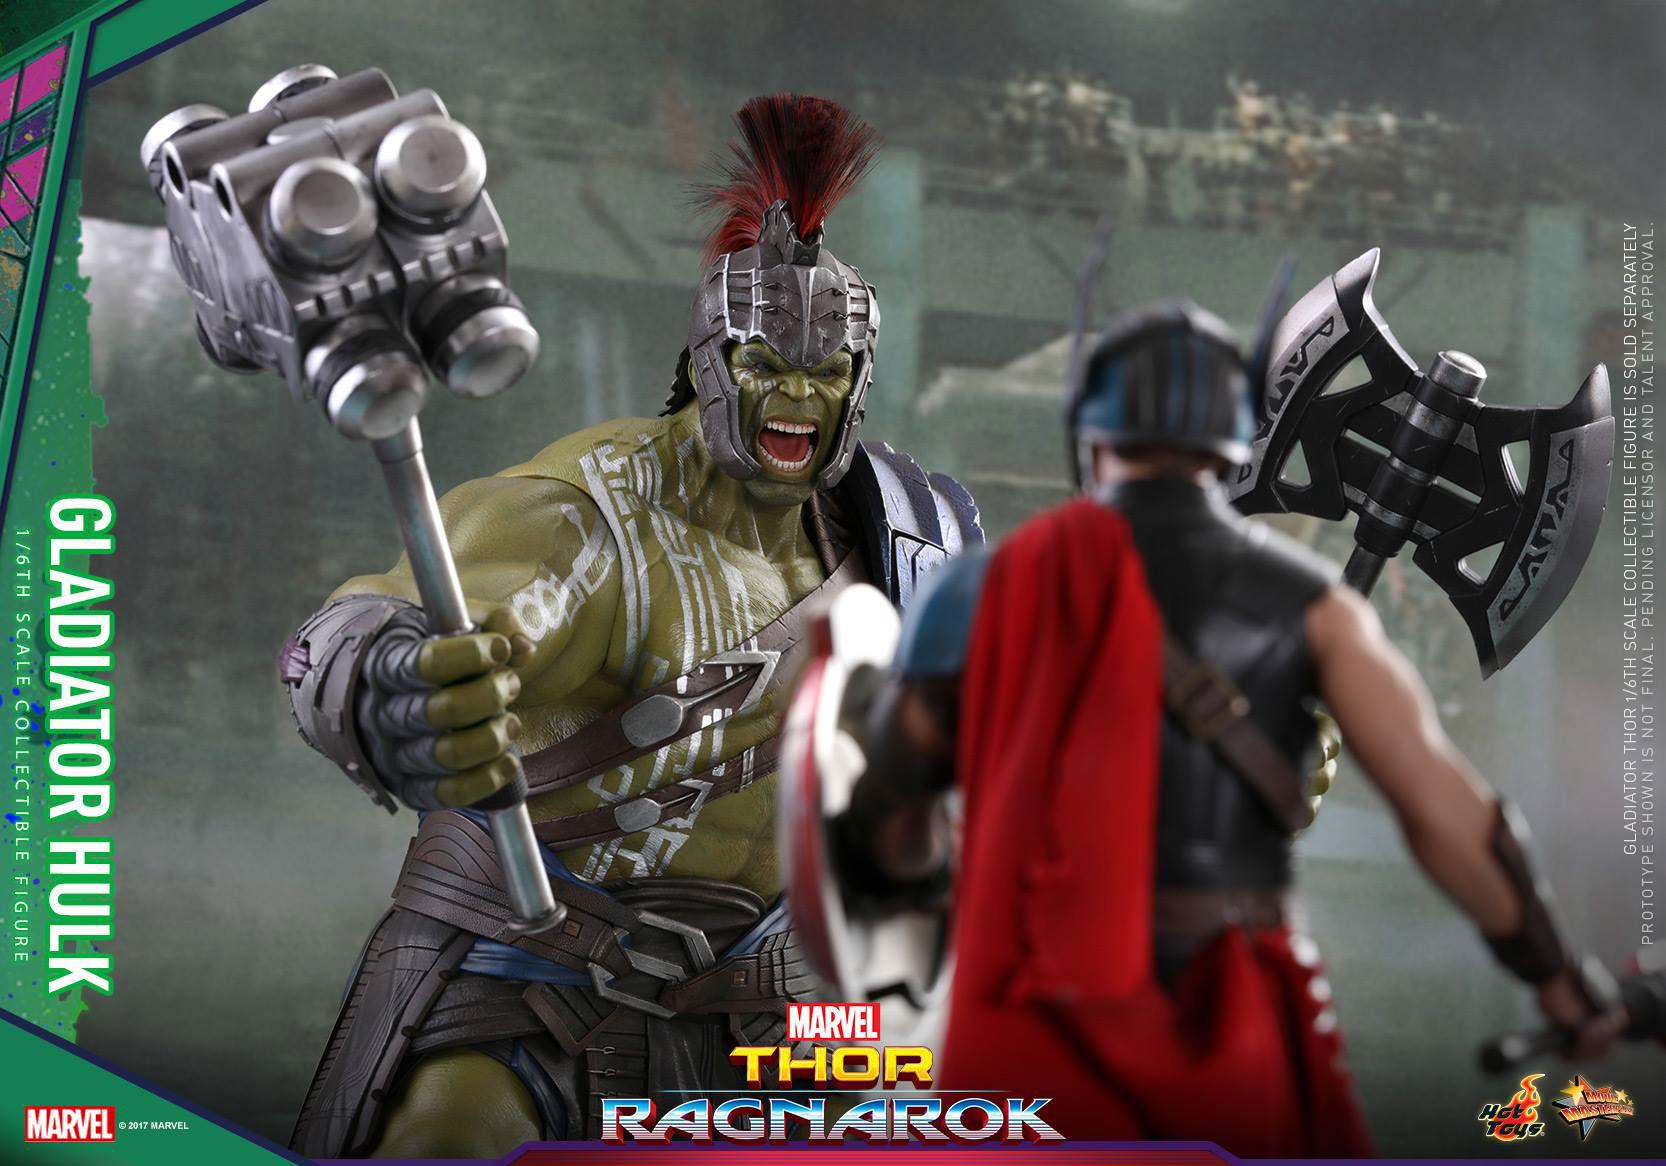 thor-ragnarok-gladiator-hulk-hot-toys-figure-3